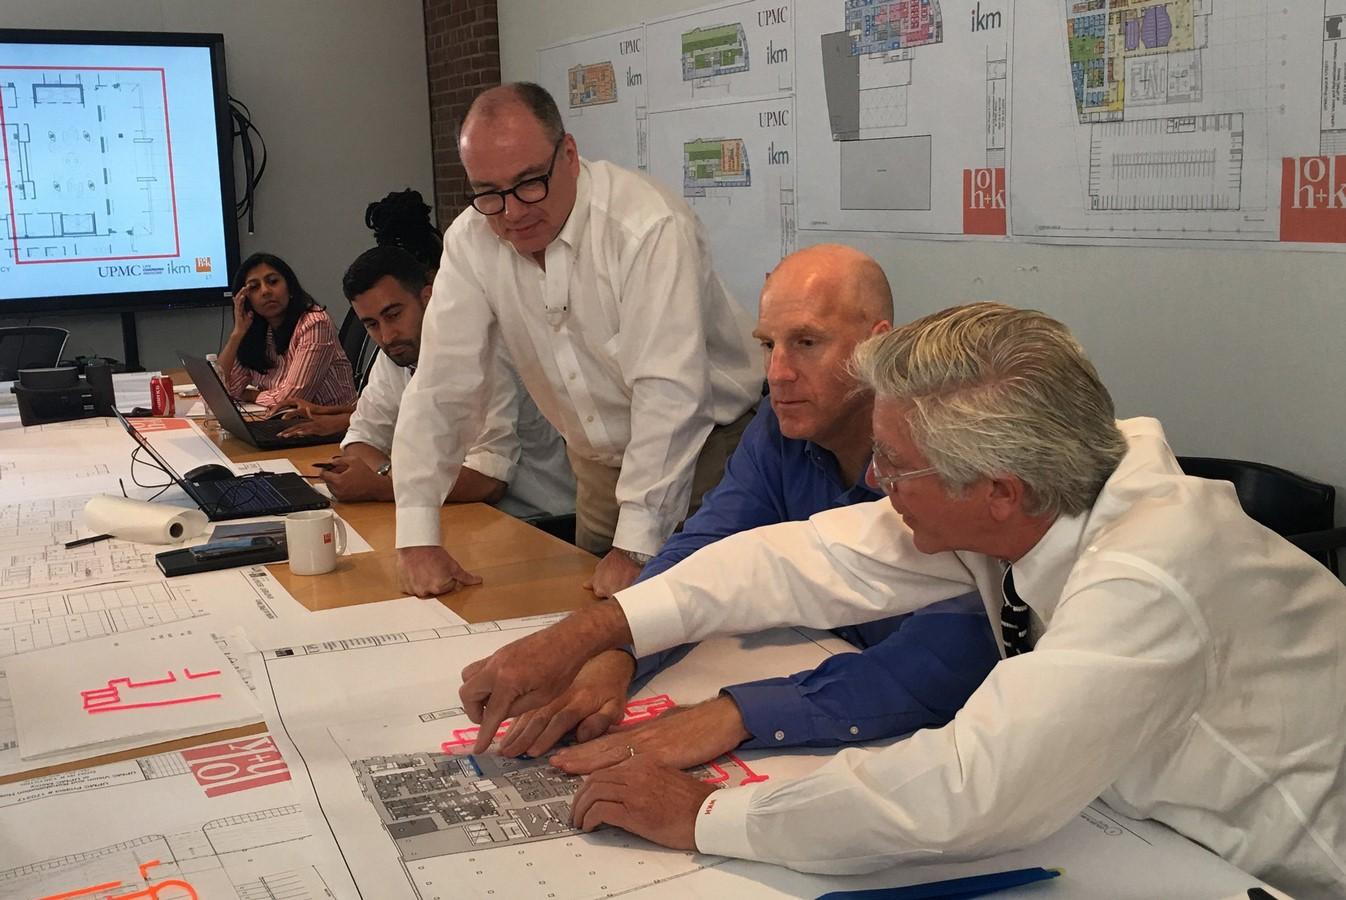 Chris Downey: The blind Architect - Sheet6